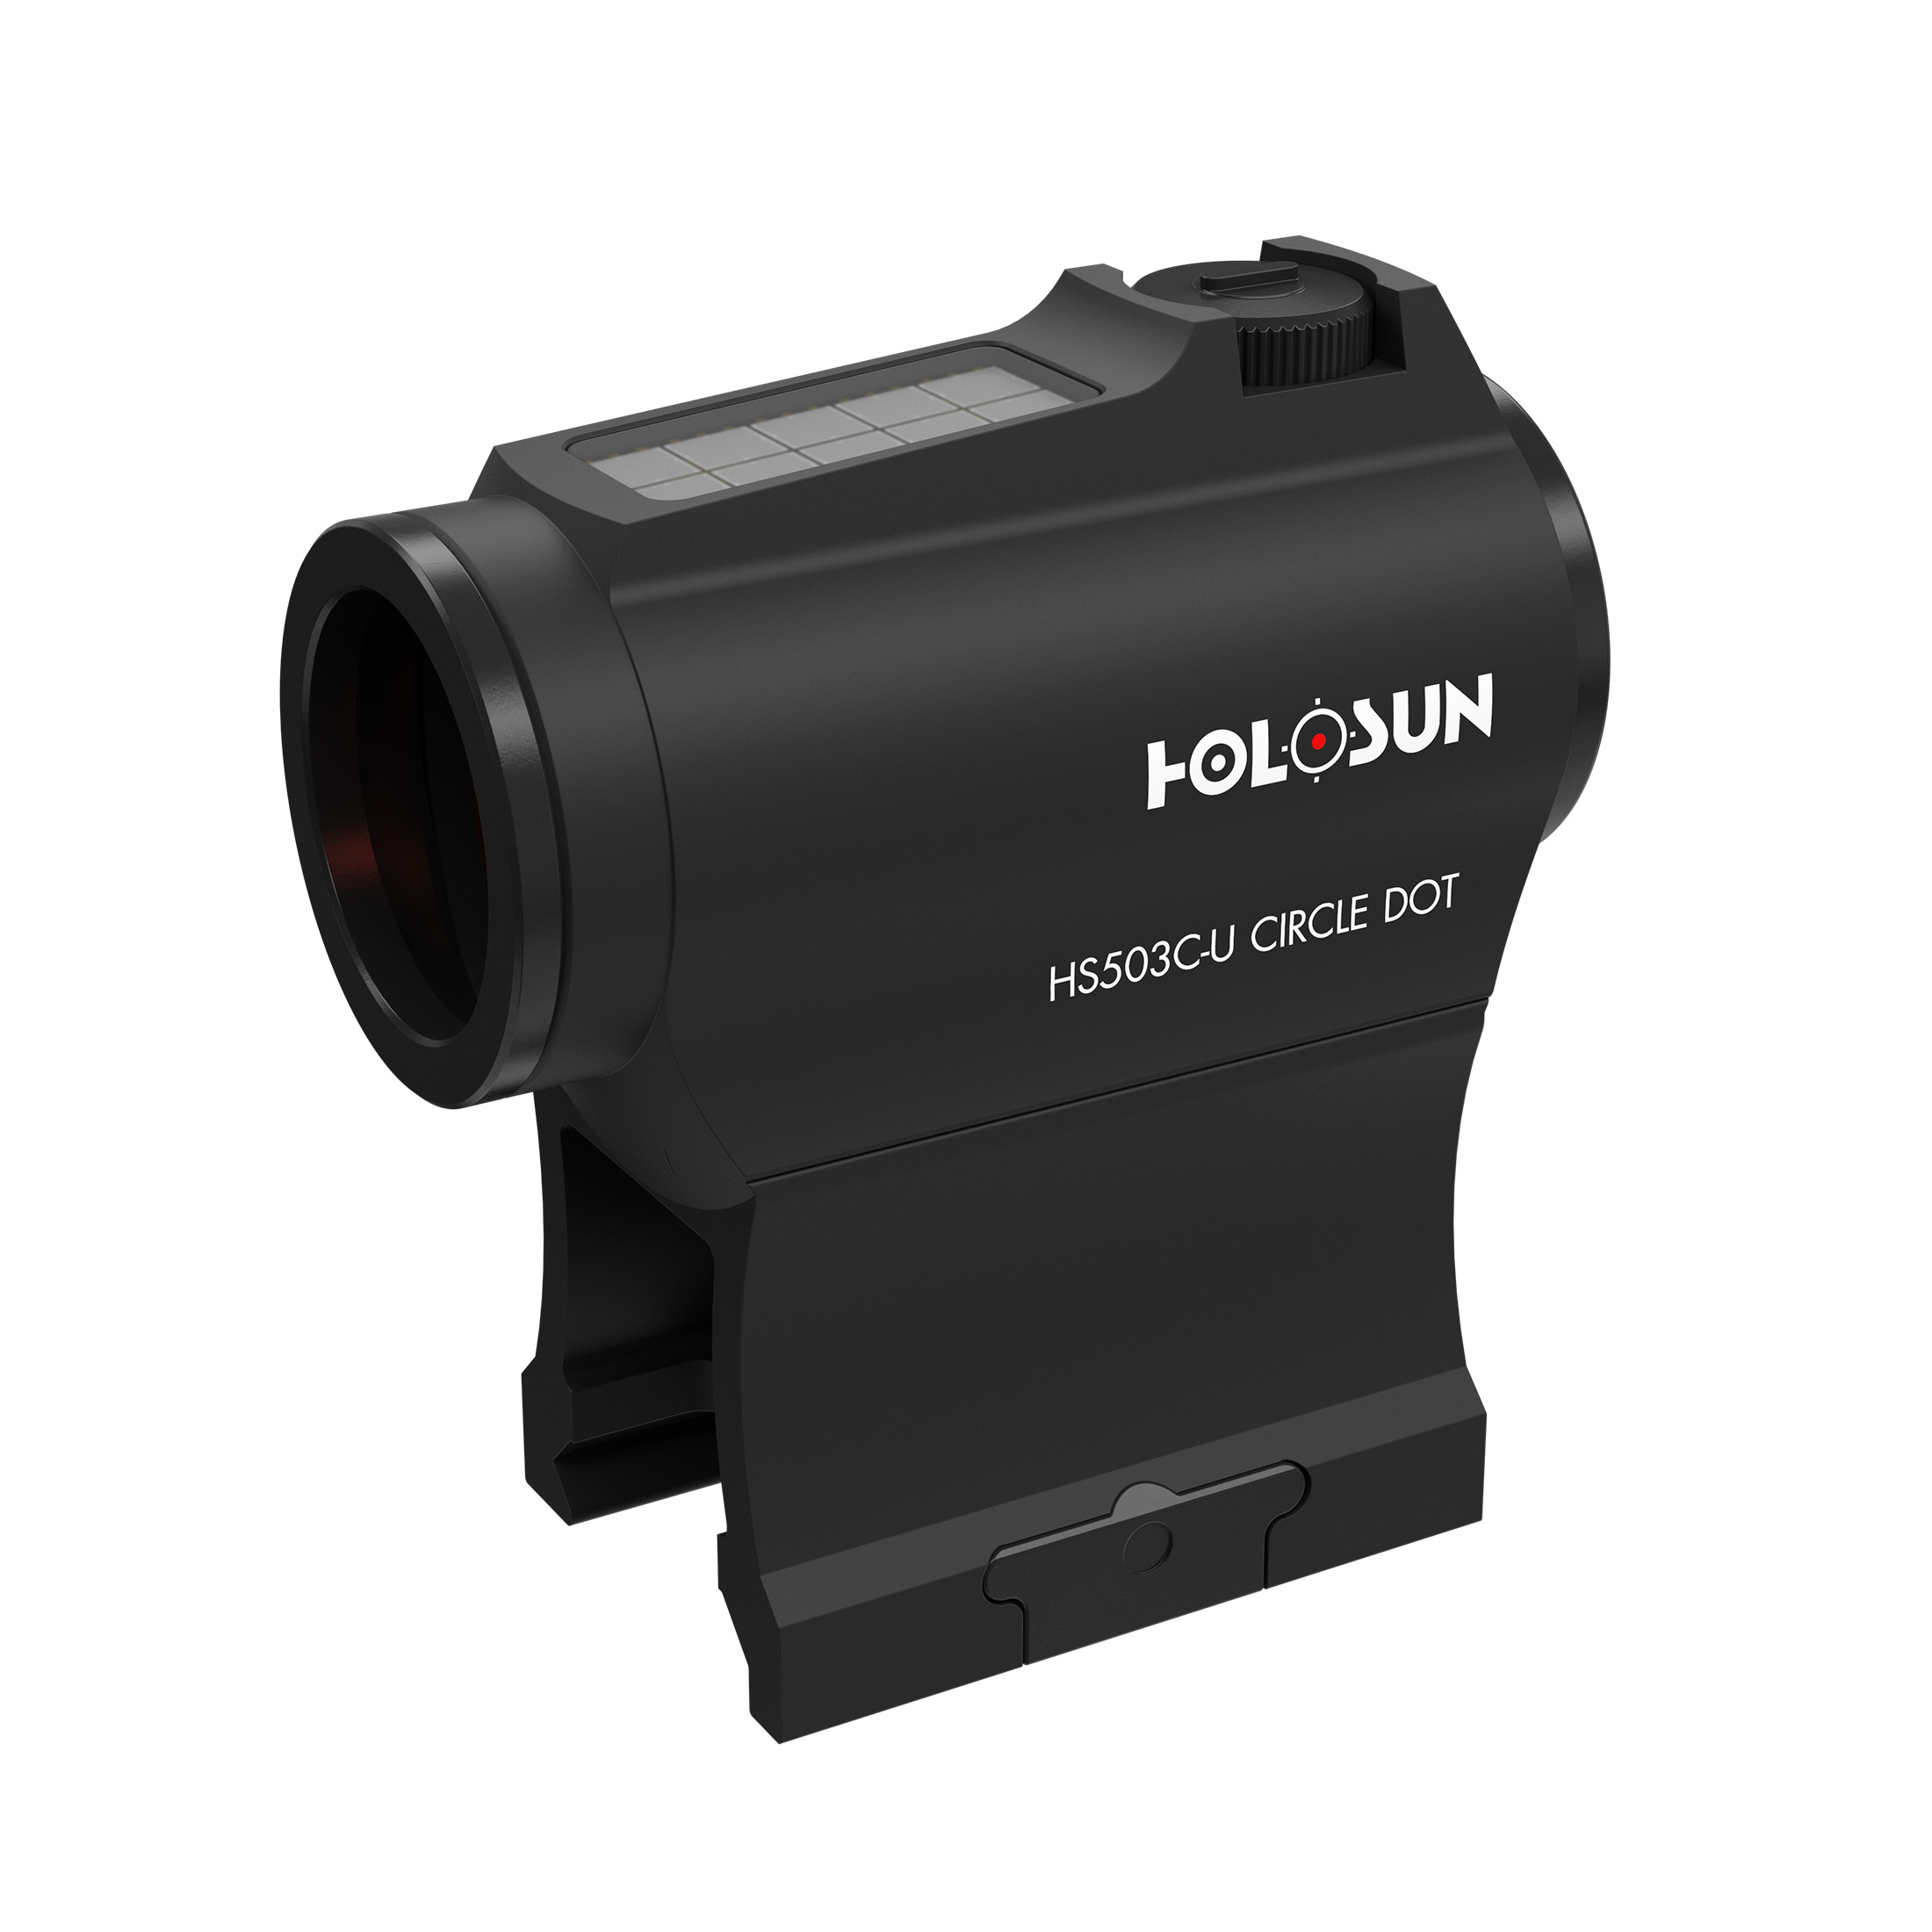 Holosun ELITE HE503C-U-GR